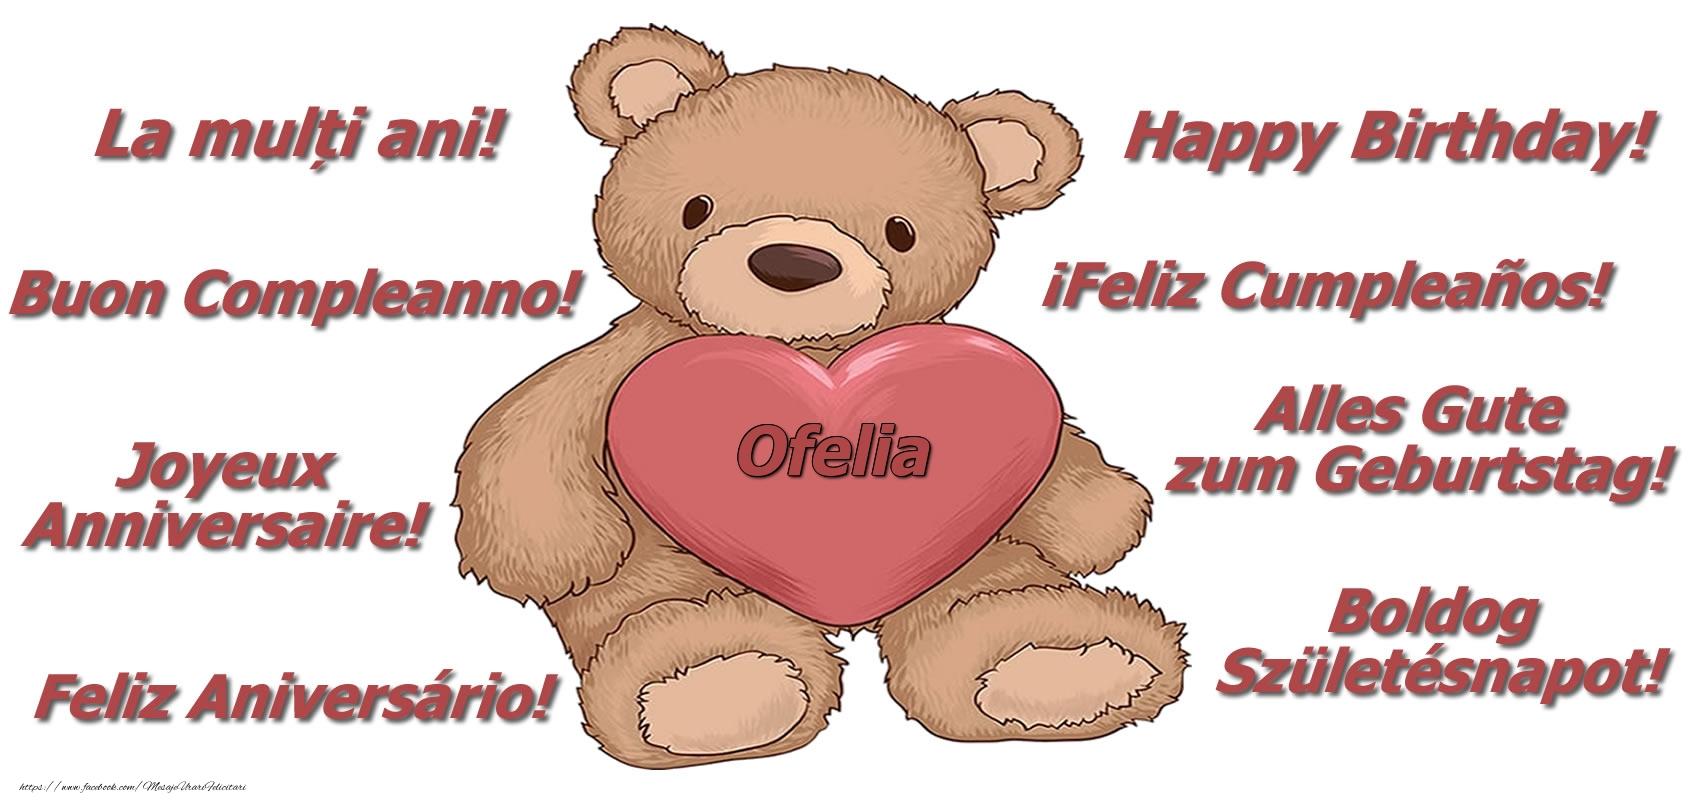 Felicitari de zi de nastere - La multi ani Ofelia! - Ursulet